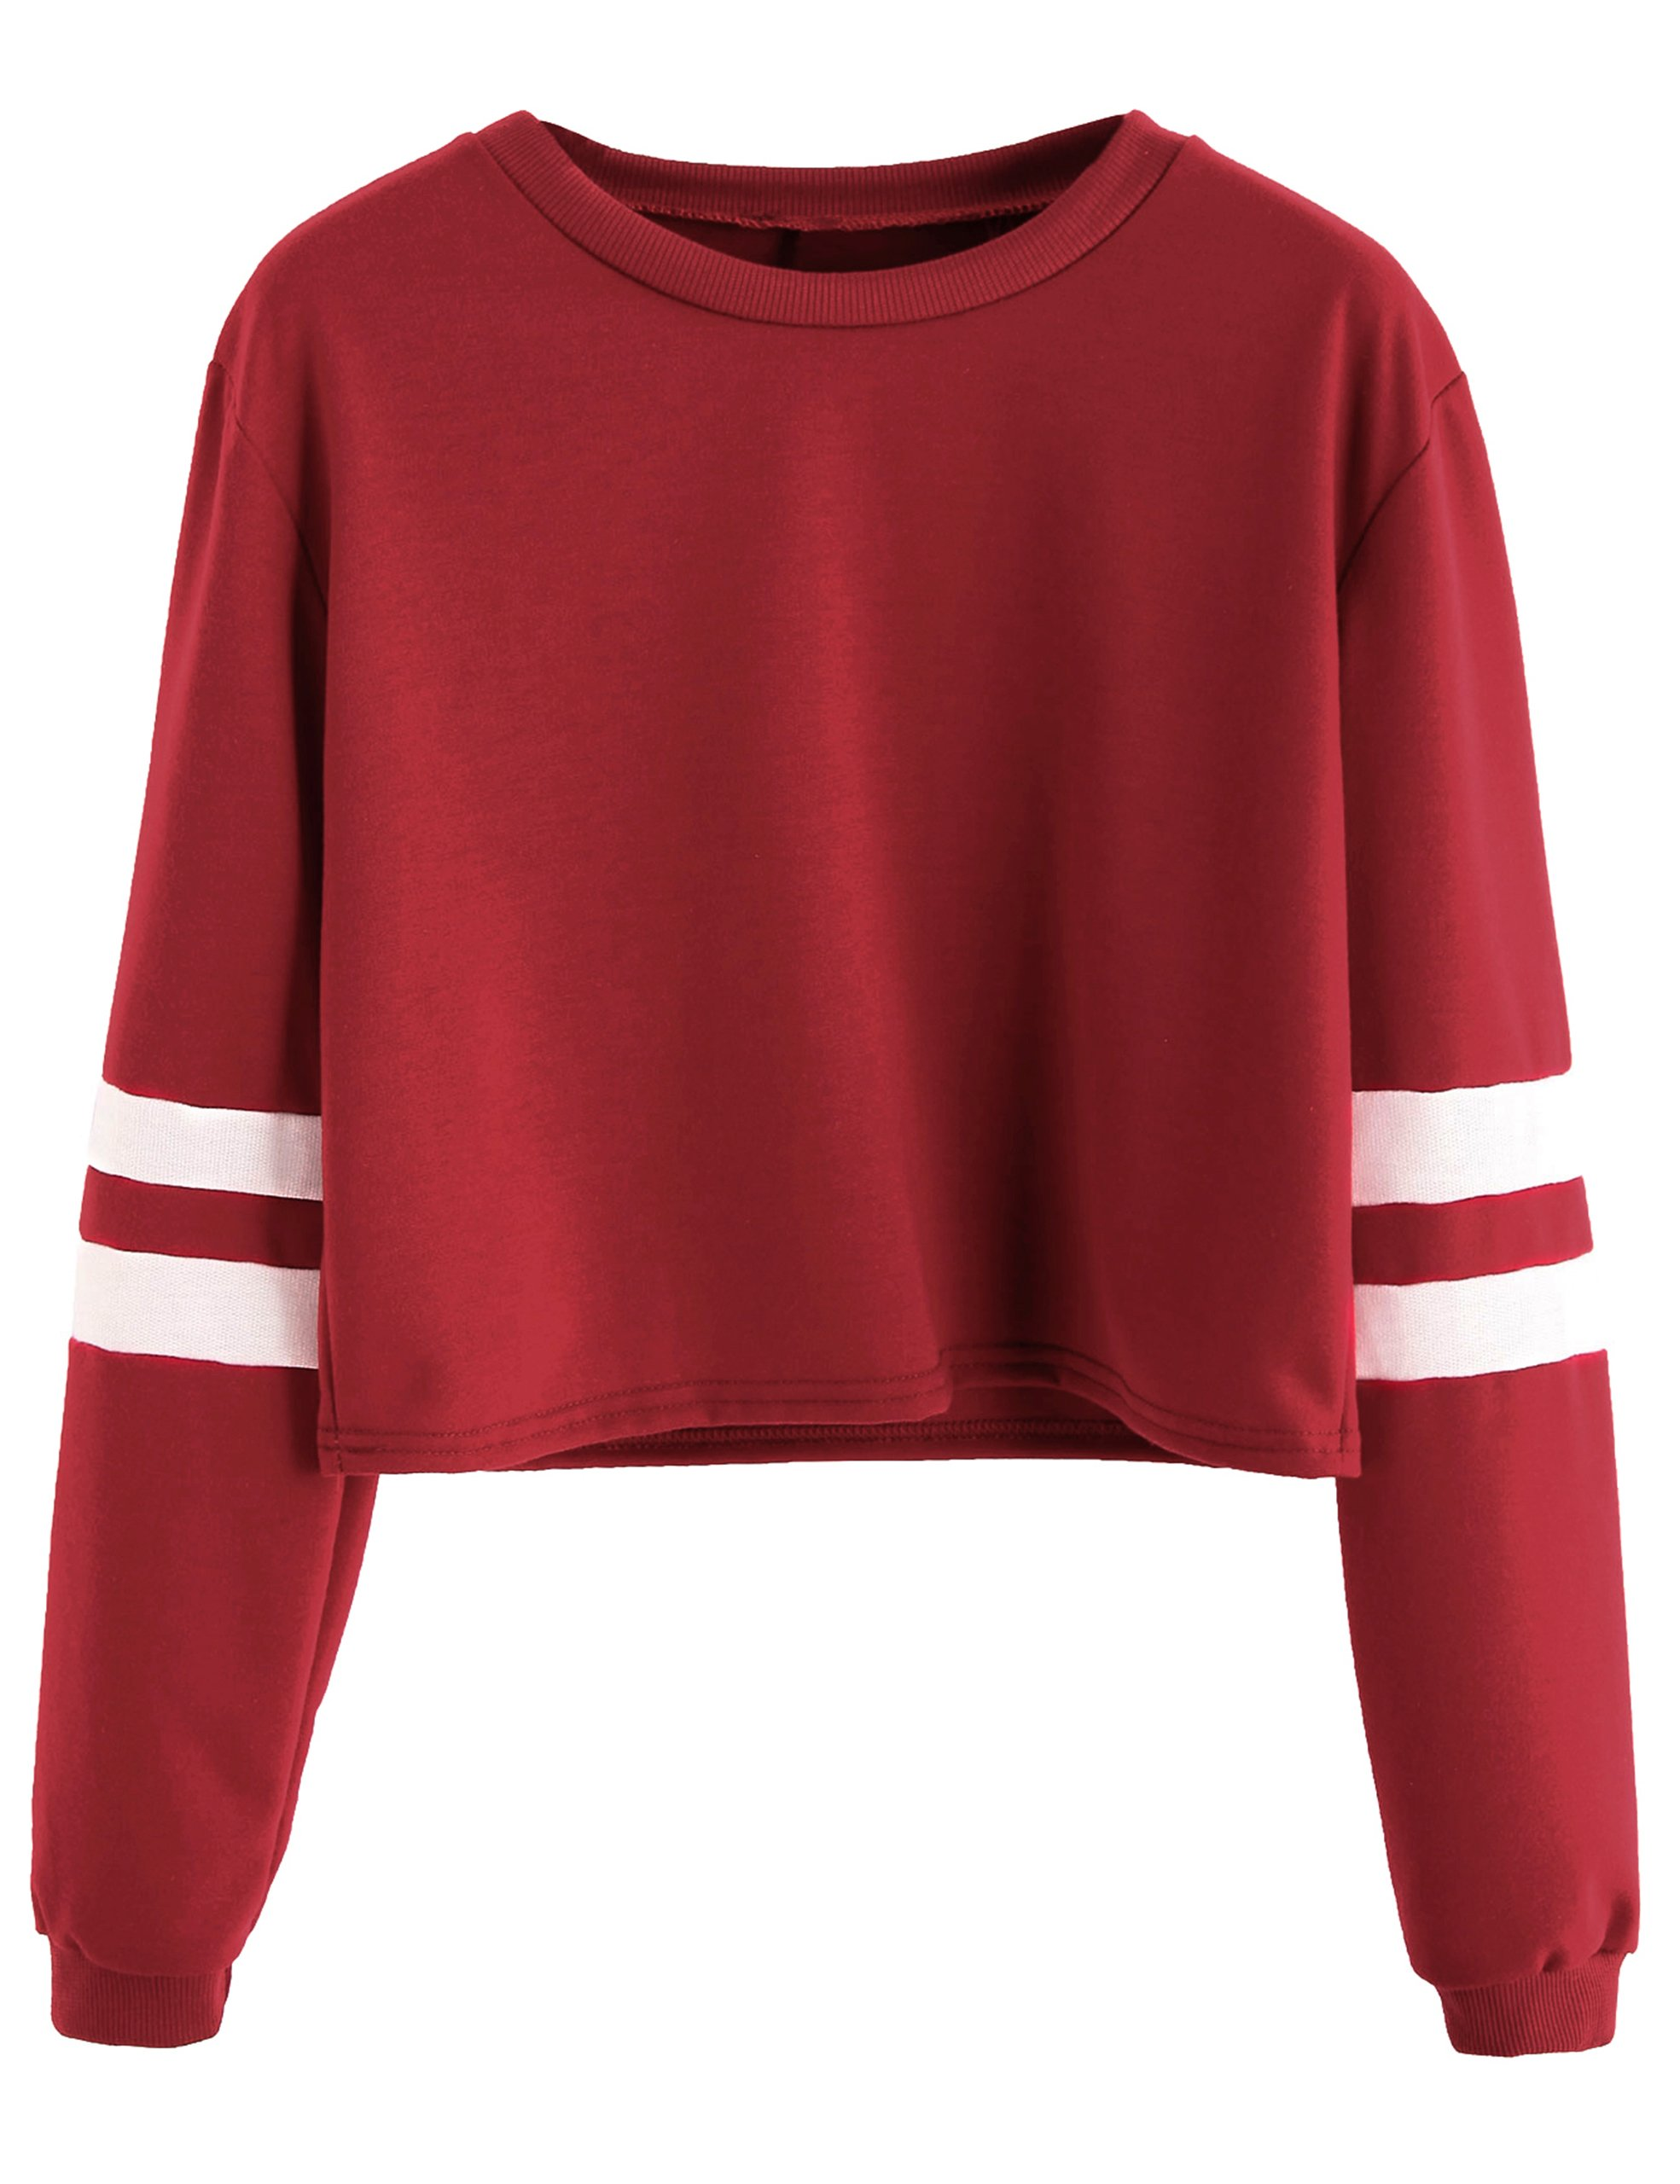 SweatyRocks Women's Striped Long Sleeve Crewneck Crop Top Sweatshirt Burgundy M